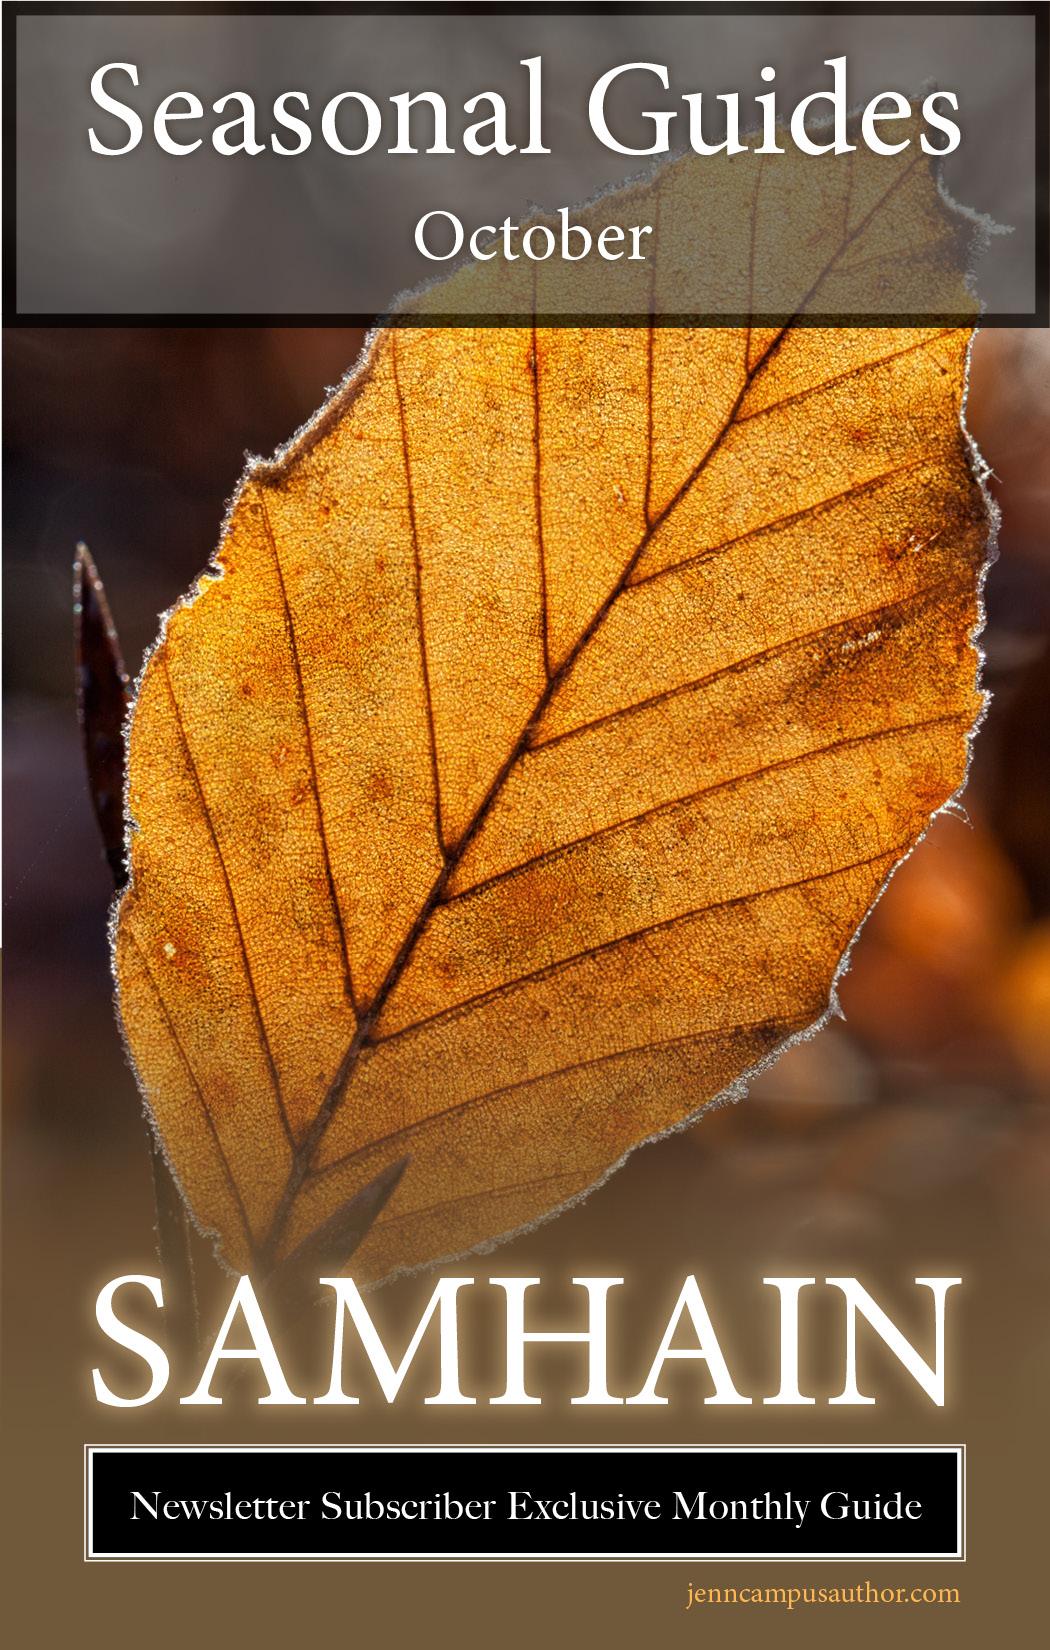 Seasonal Guide for October - Samhain